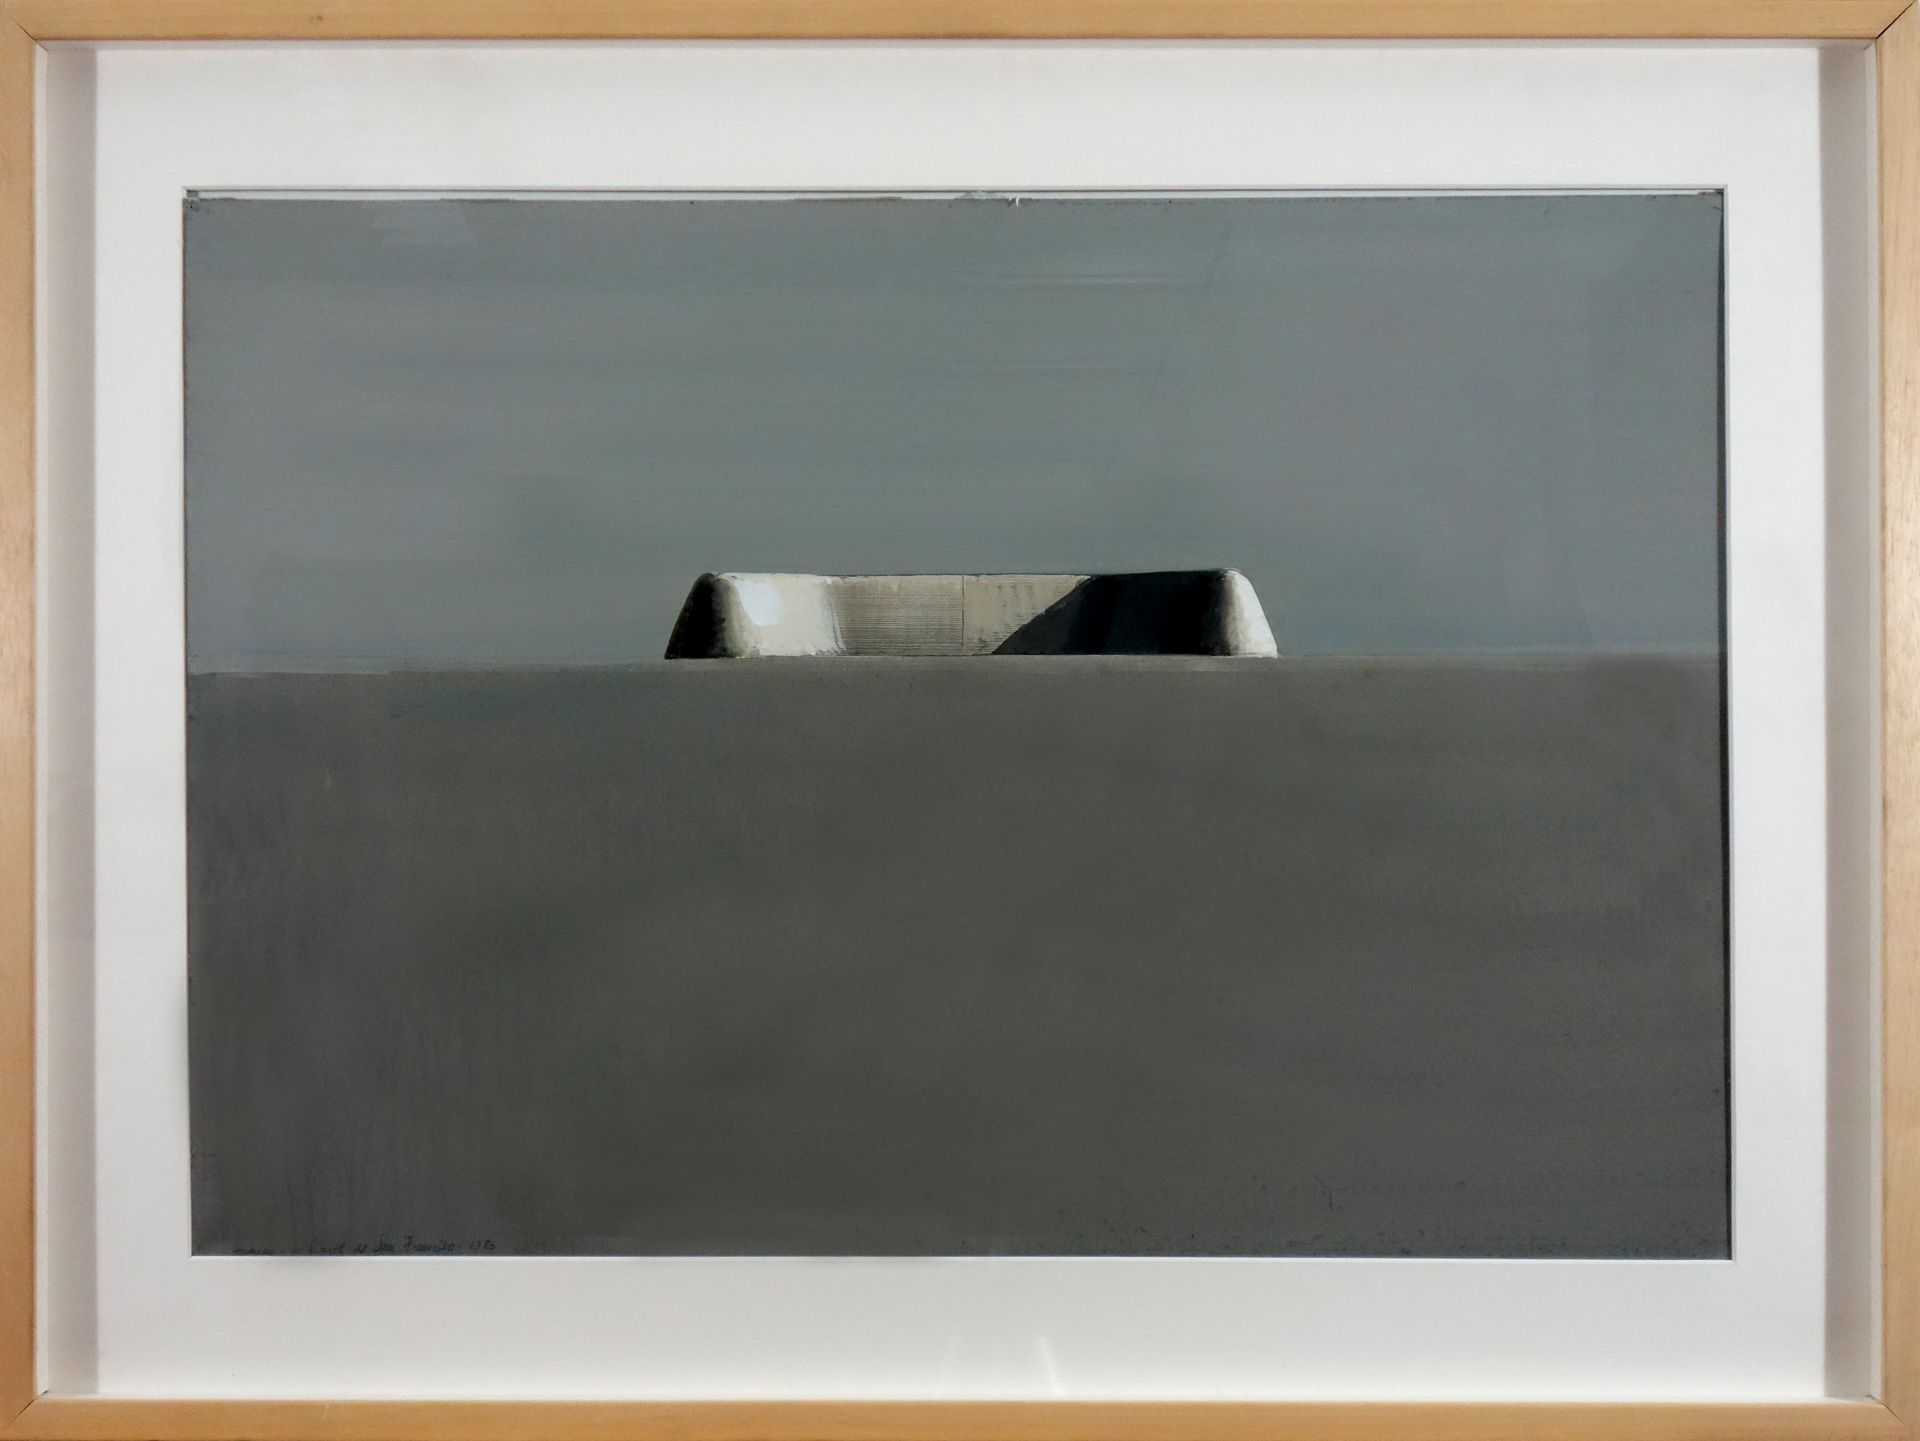 Horia Damian (*1922) Le Projekt de San Francisco (1980) - Bild 2 aus 3